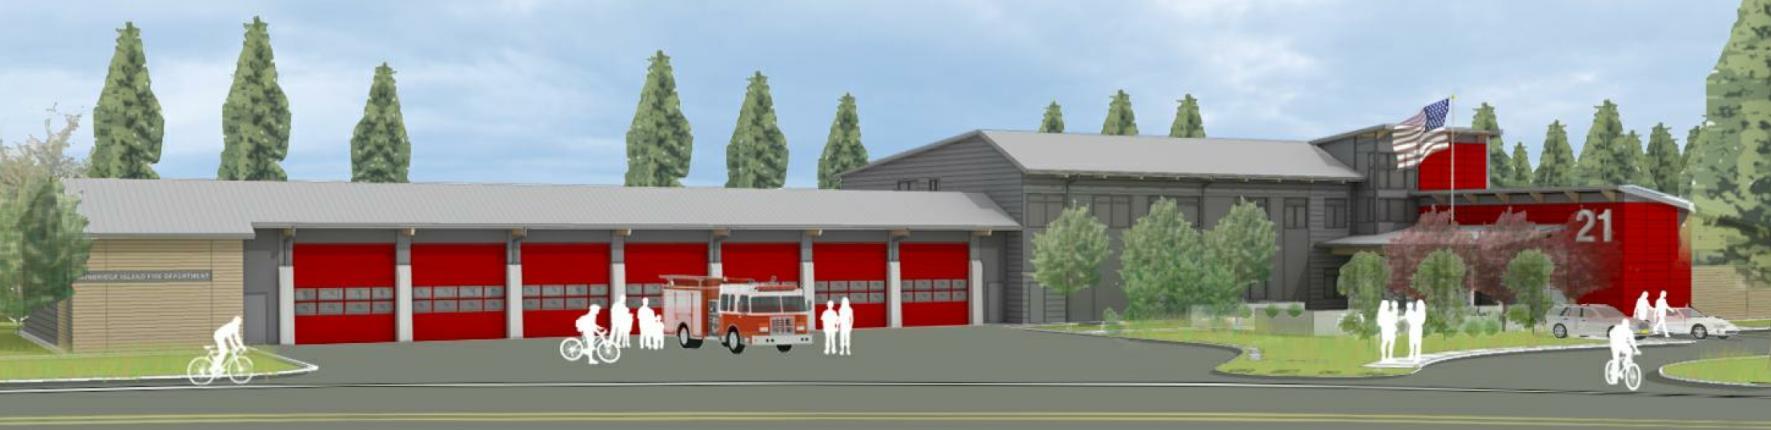 ambulance design plan, firehouse floor plans dimensions, firehouse interior design, on firehouse design station floor plan